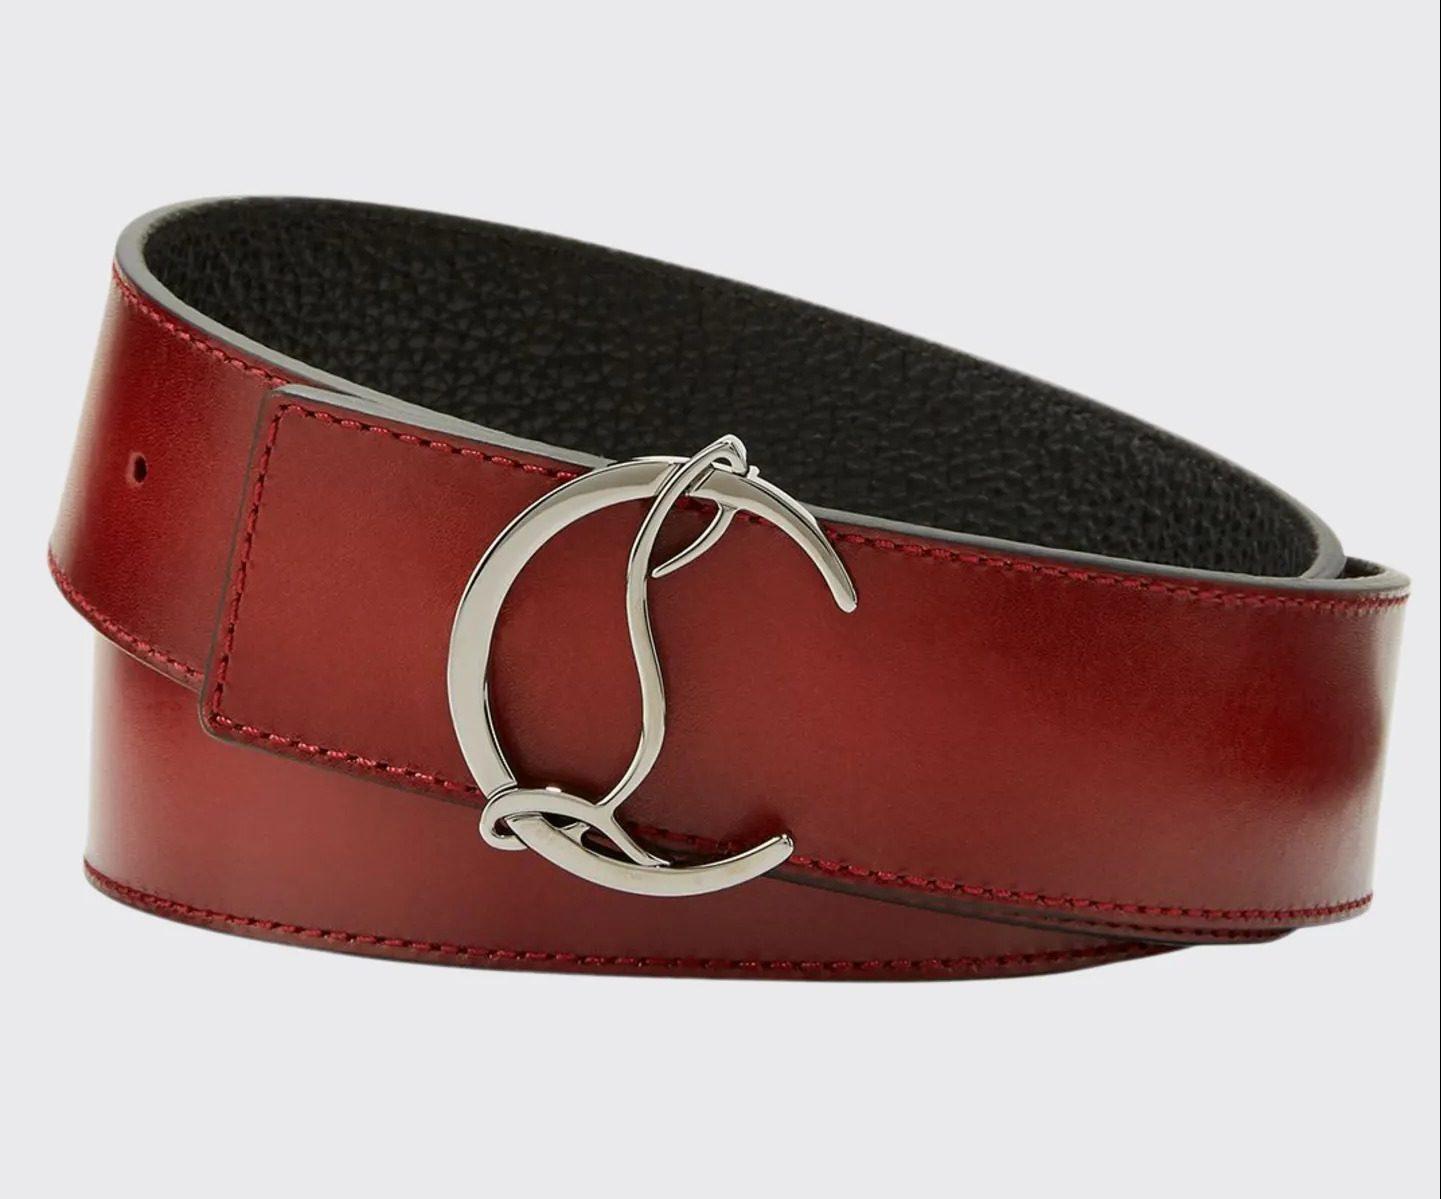 Christian-Louboutin-Mens-Reversible-CL-Logo-Leather-Belt